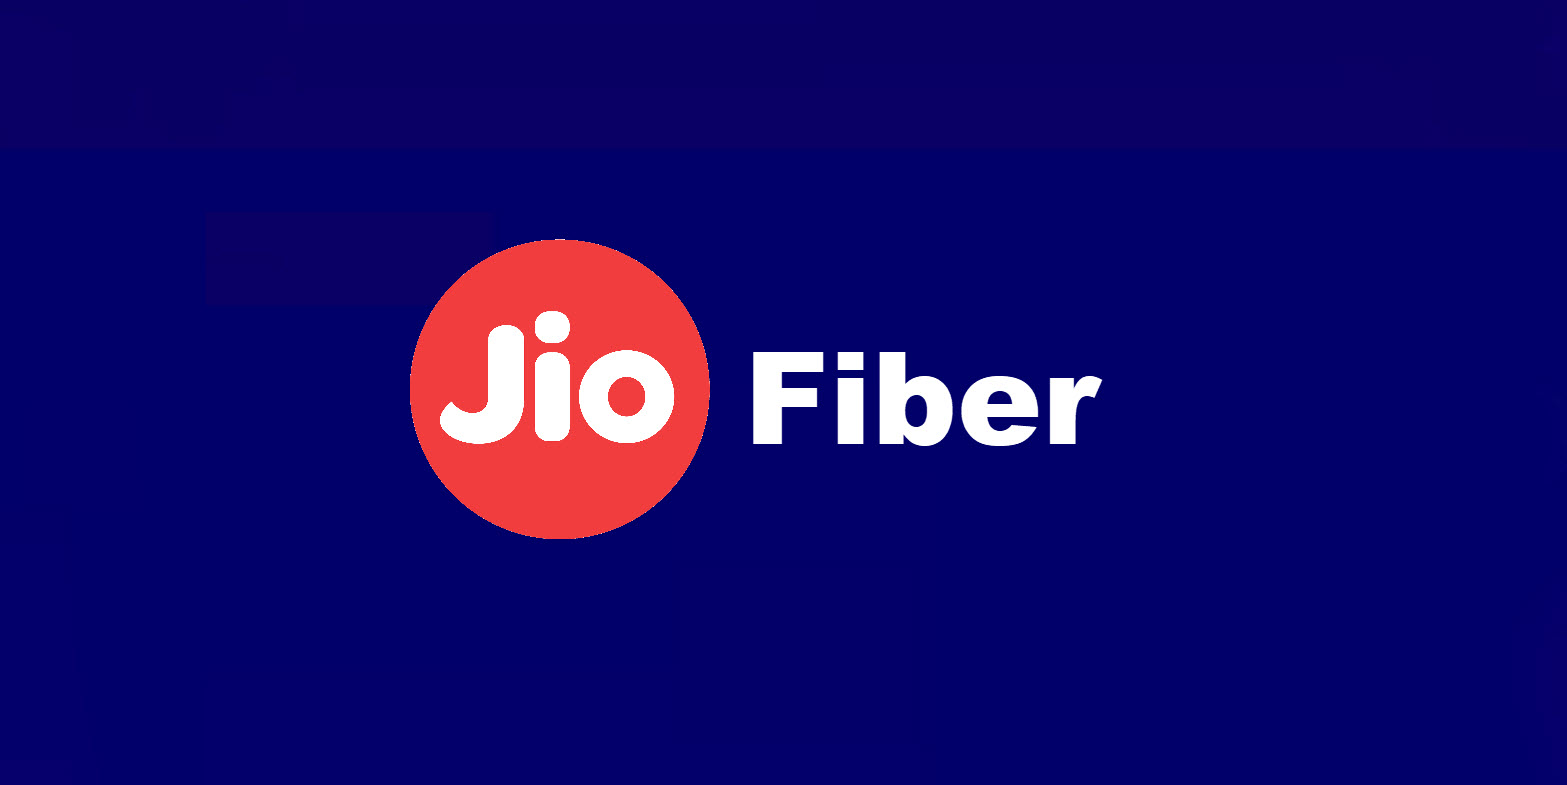 Cómo registrar Jio GigaFiber